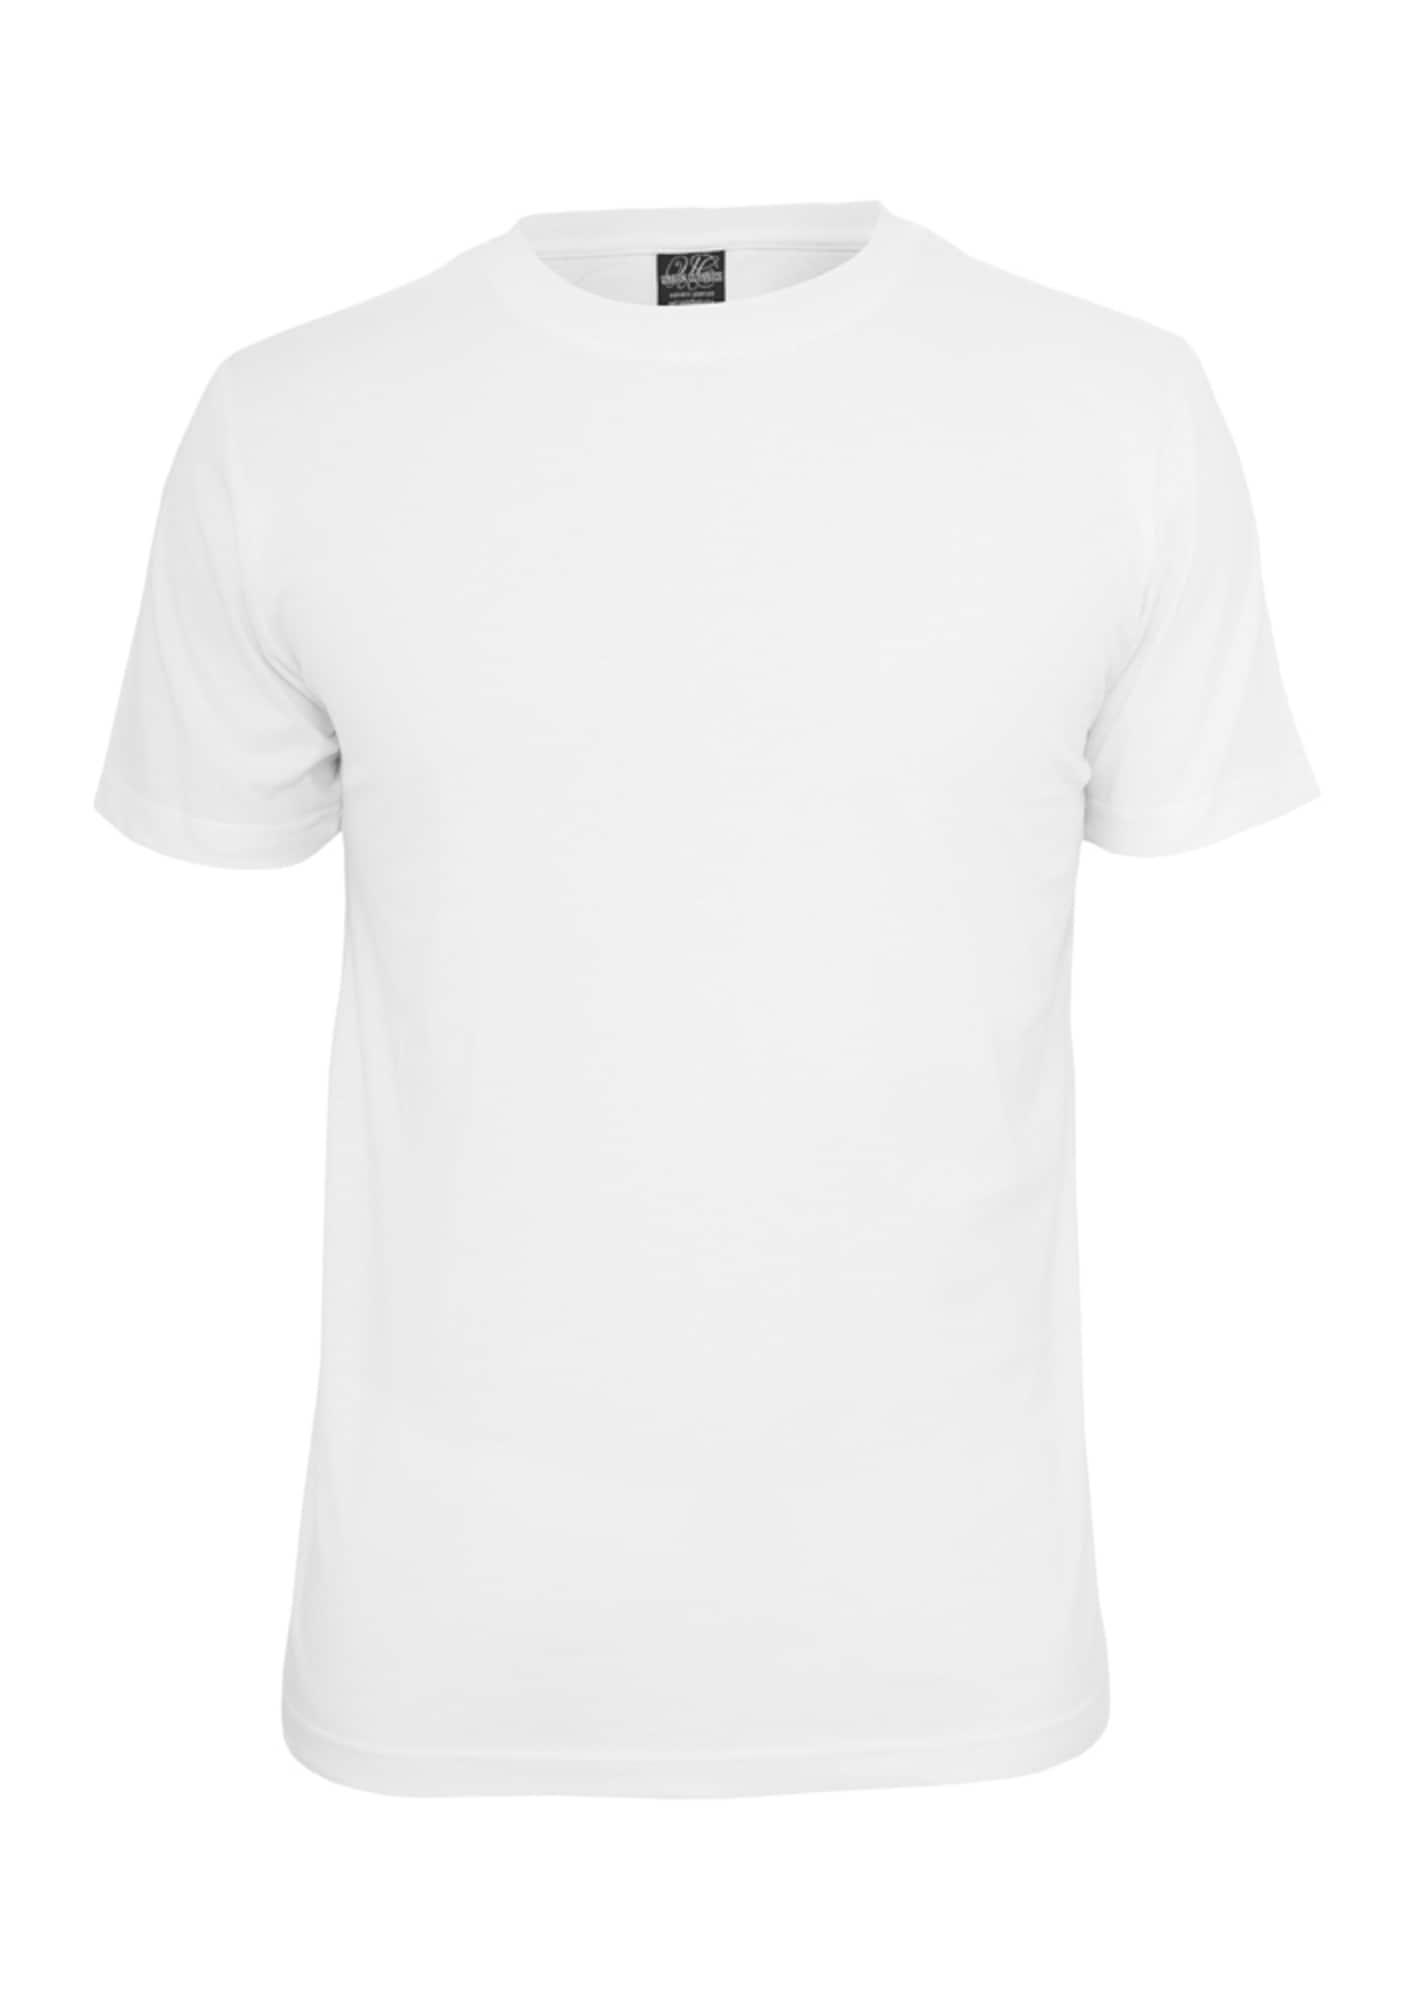 Urban Classics T-Shirt  - Blanc - Taille: XXL - male